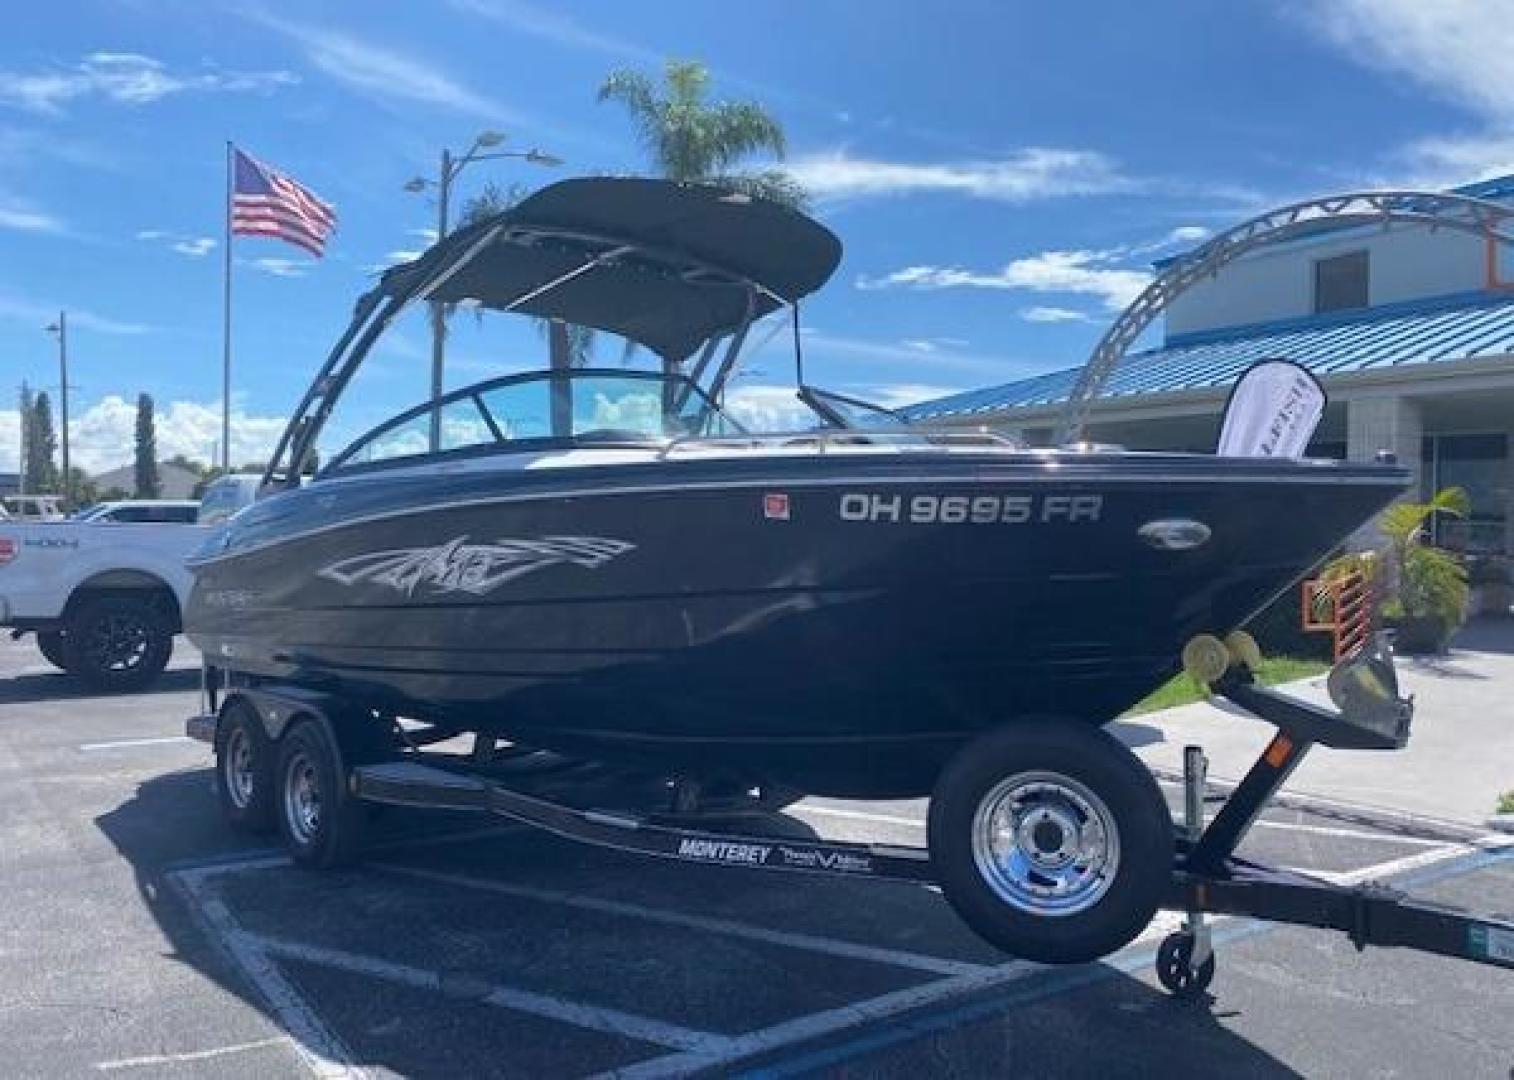 Monterey-224FSX 2017-Monterey 224FSX Tampa Bay-Florida-United States-1530706 | Thumbnail